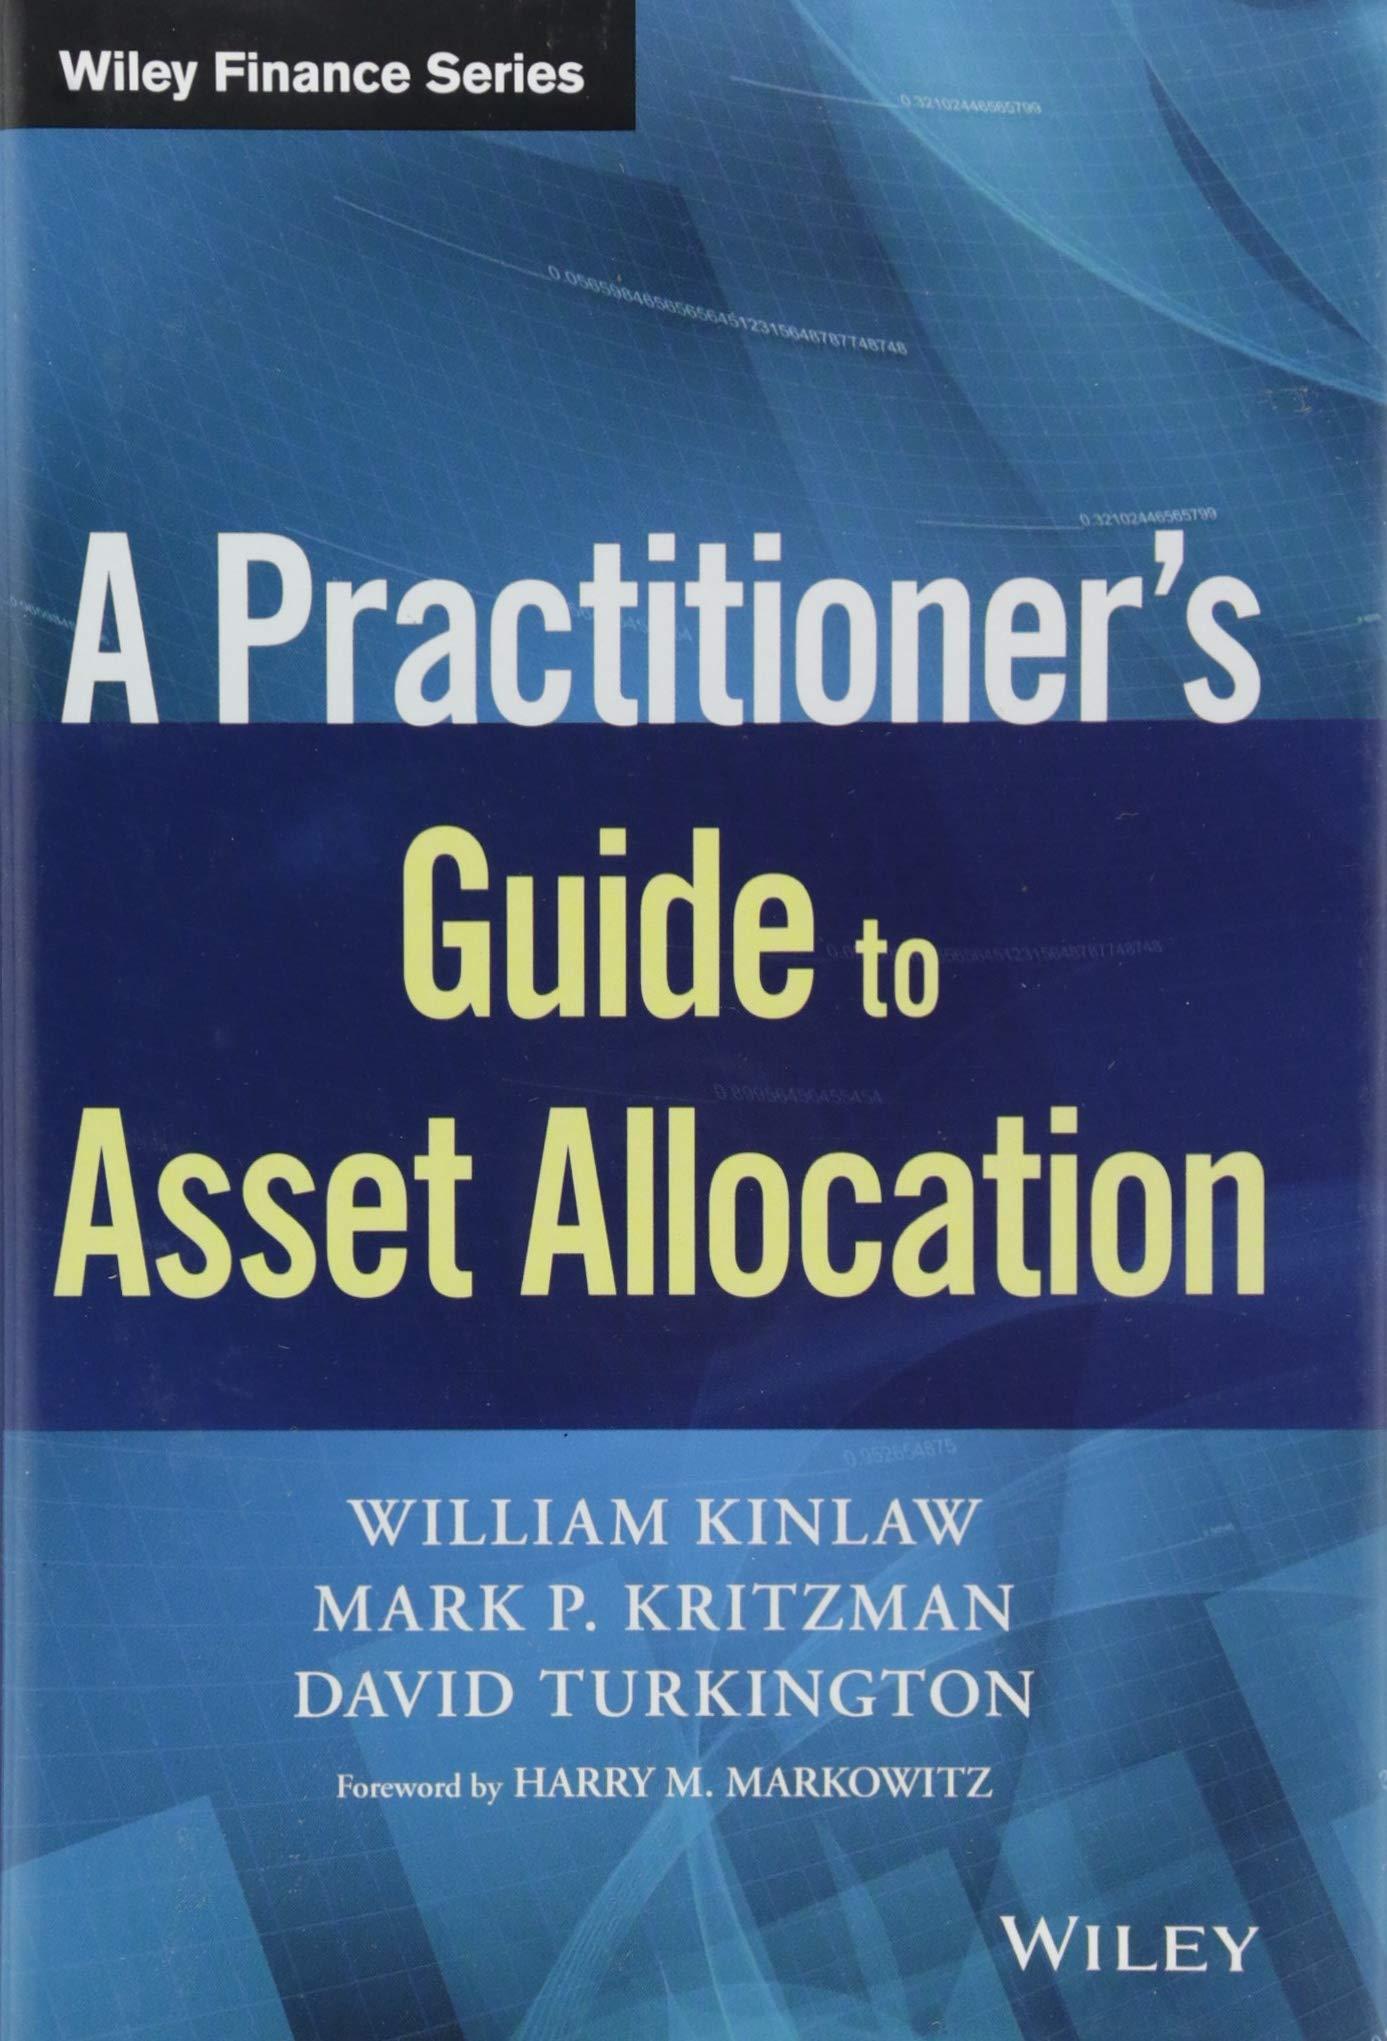 Amazon.com: A Practitioner's Guide to Asset Allocation (Wiley Finance)  (9781119397809): William Kinlaw, Mark P. Kritzman, David Turkington, ...